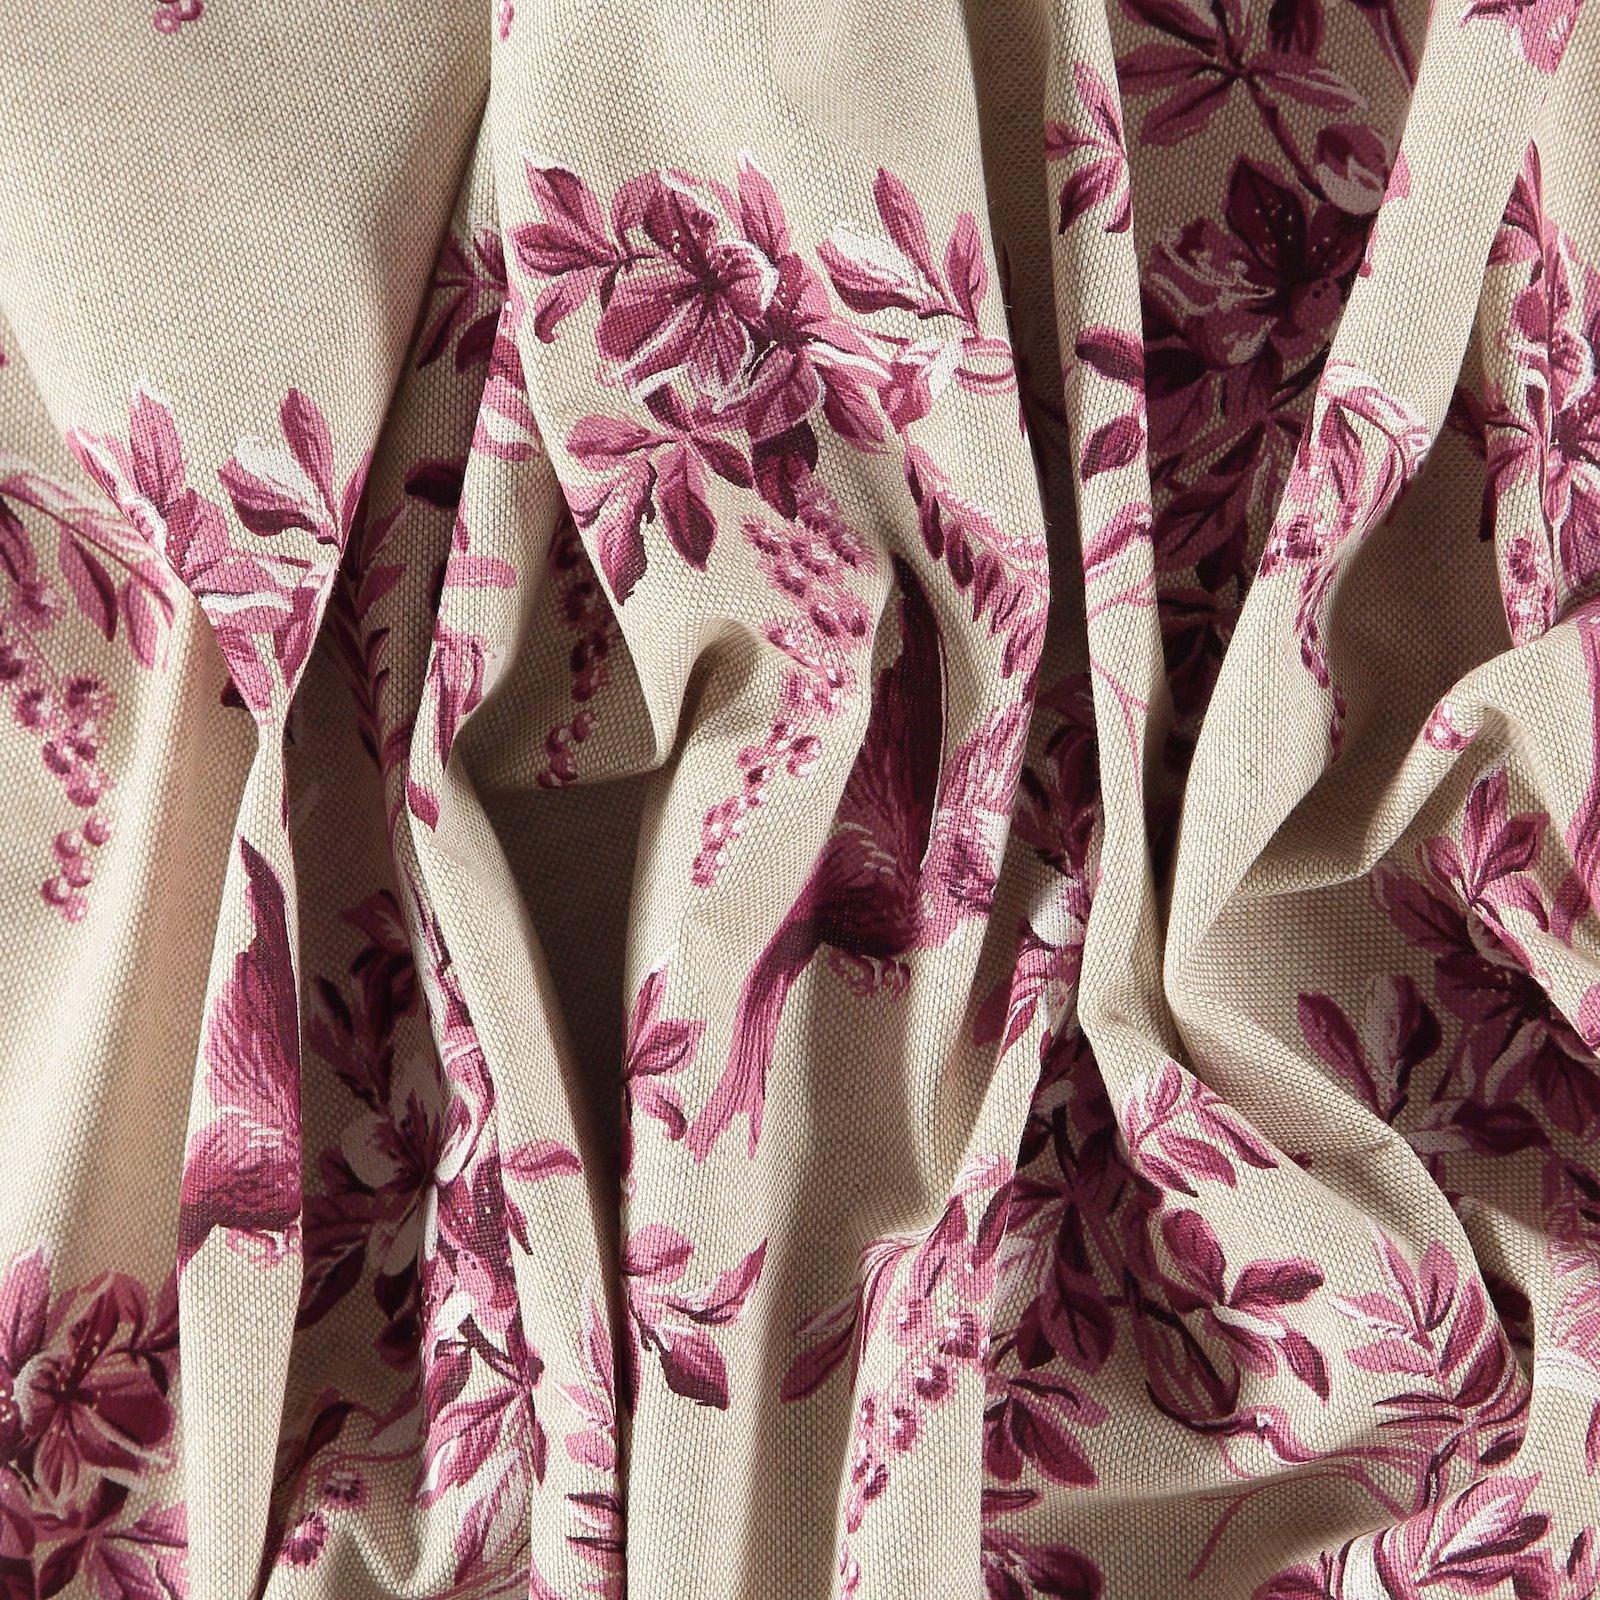 Leinenlook, Fuchsia Blumen